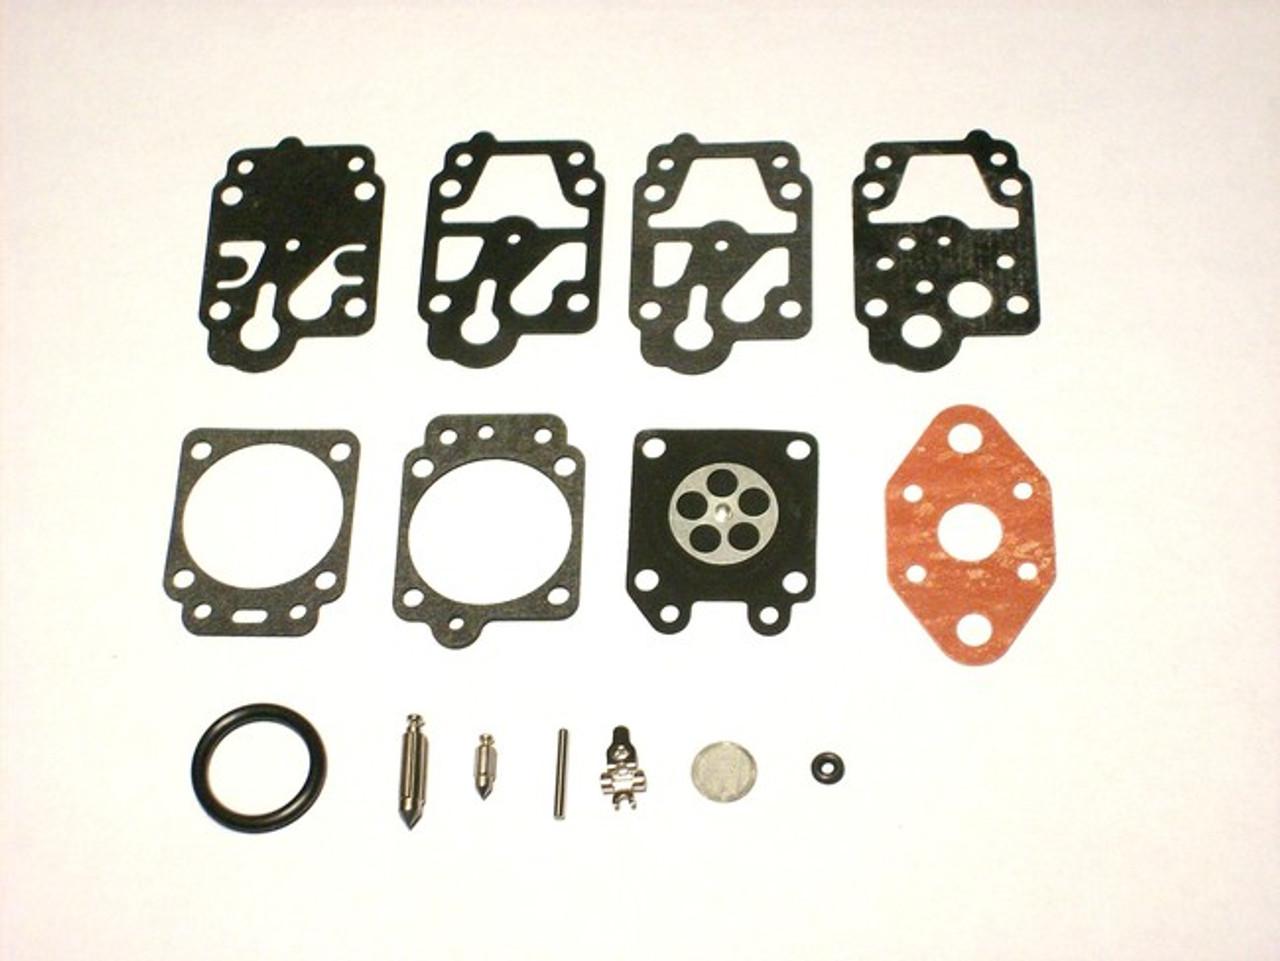 Carburetor Rebuild Kit for Honda GX22, GX31, K20WYL, K20-WYL